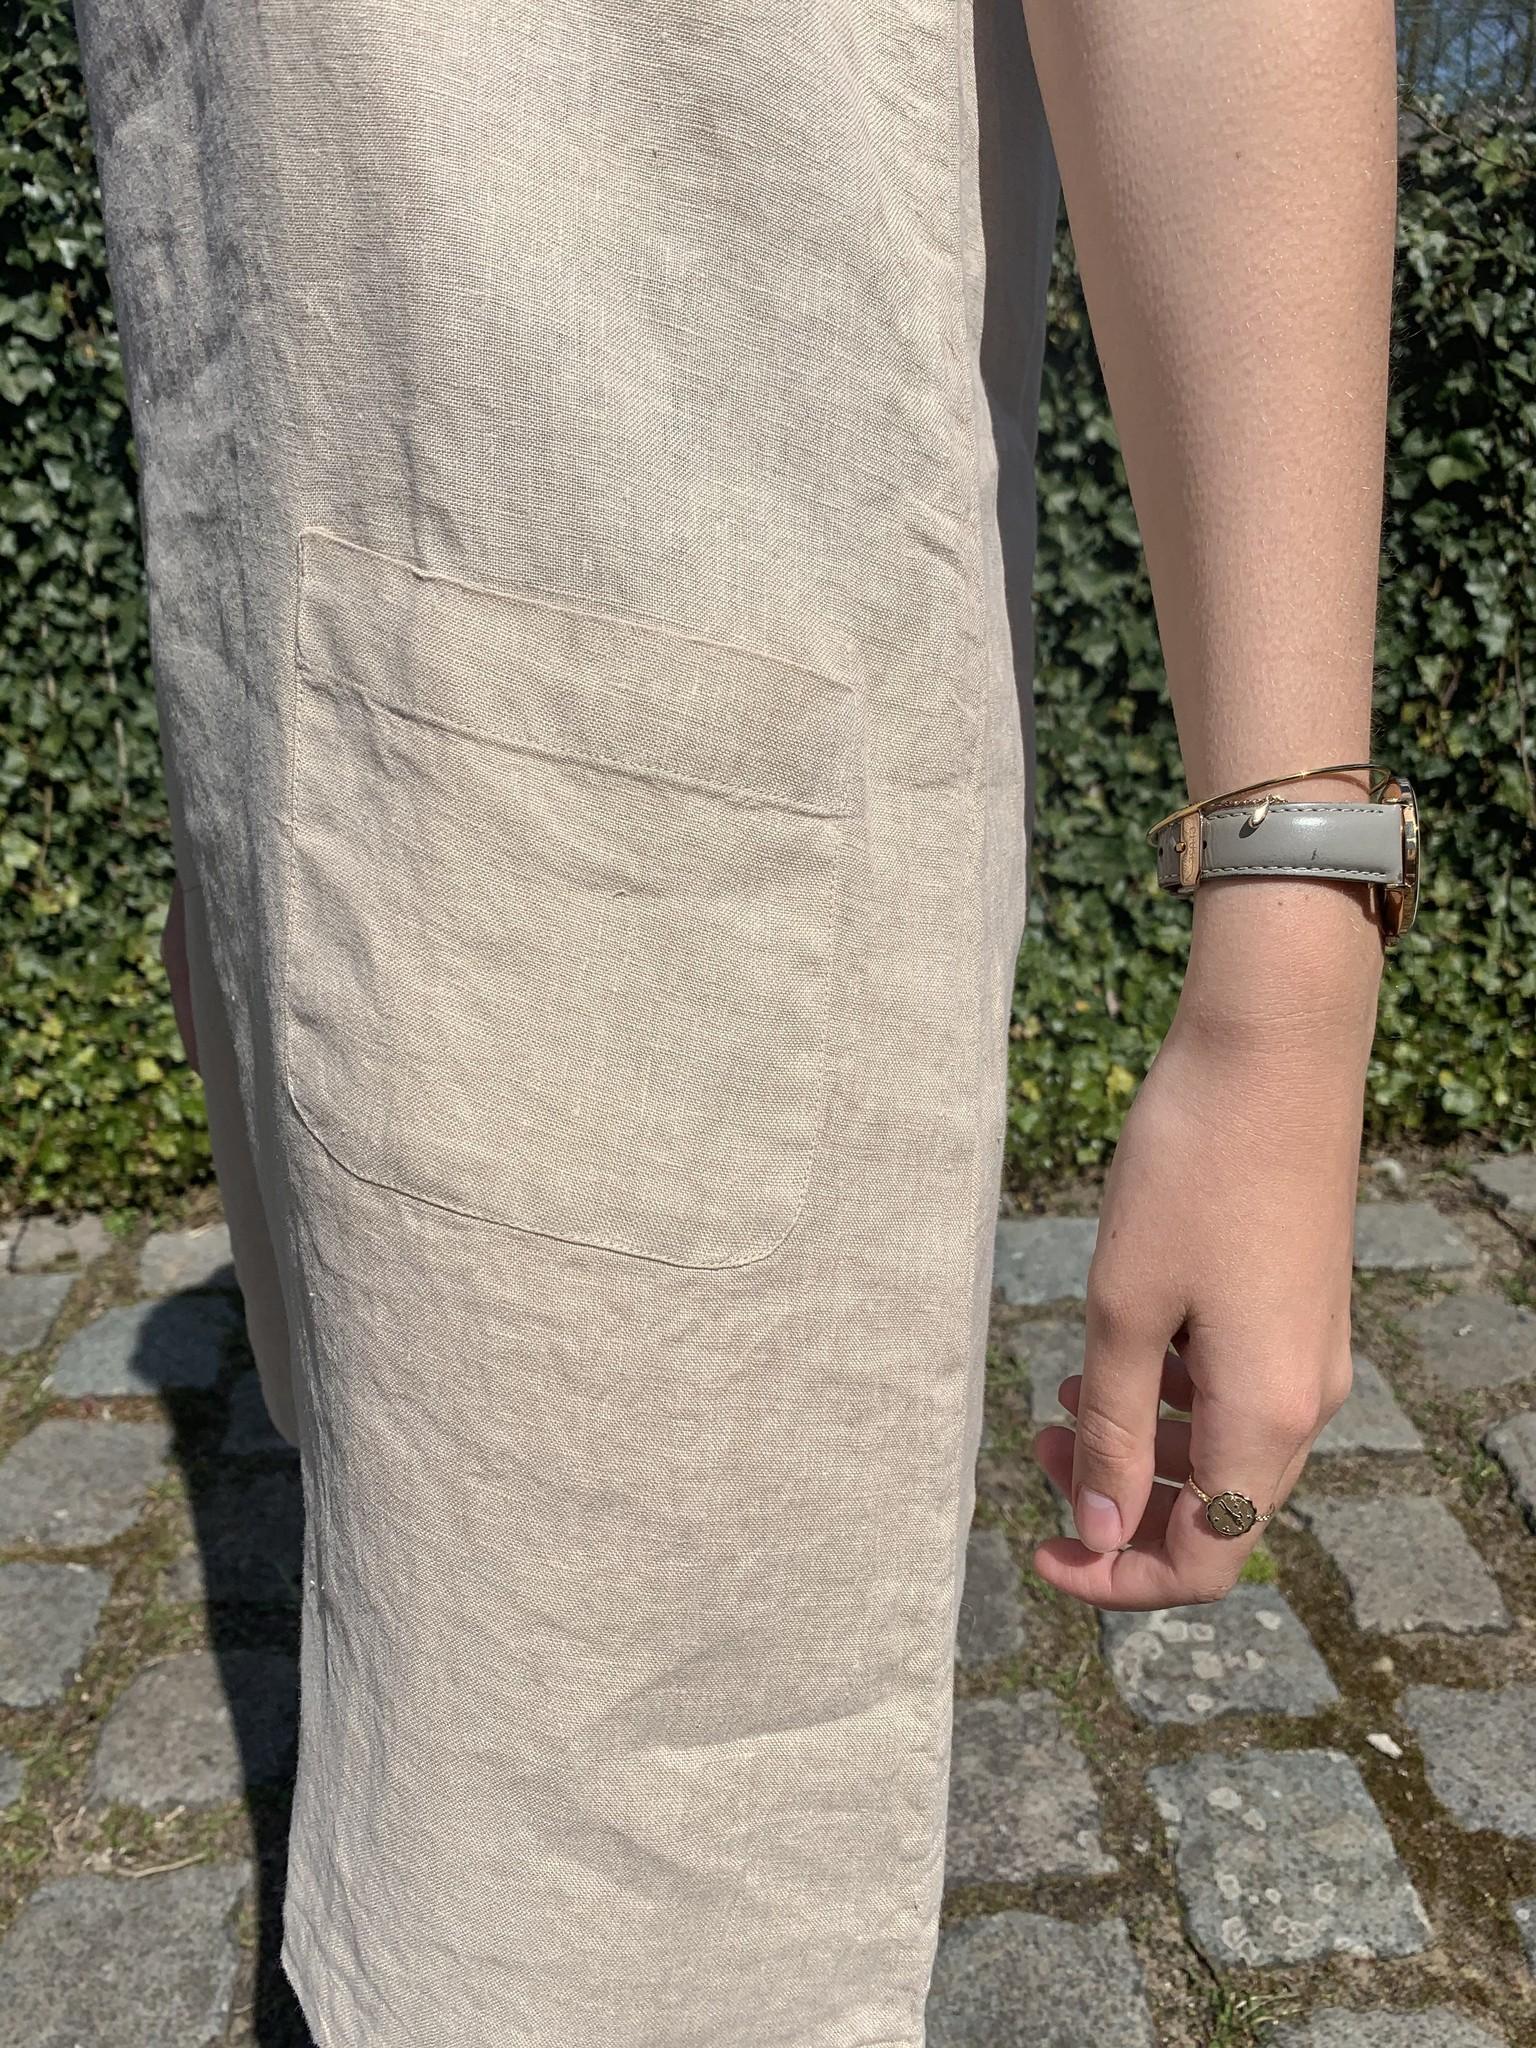 Haiti light beige or natural dress